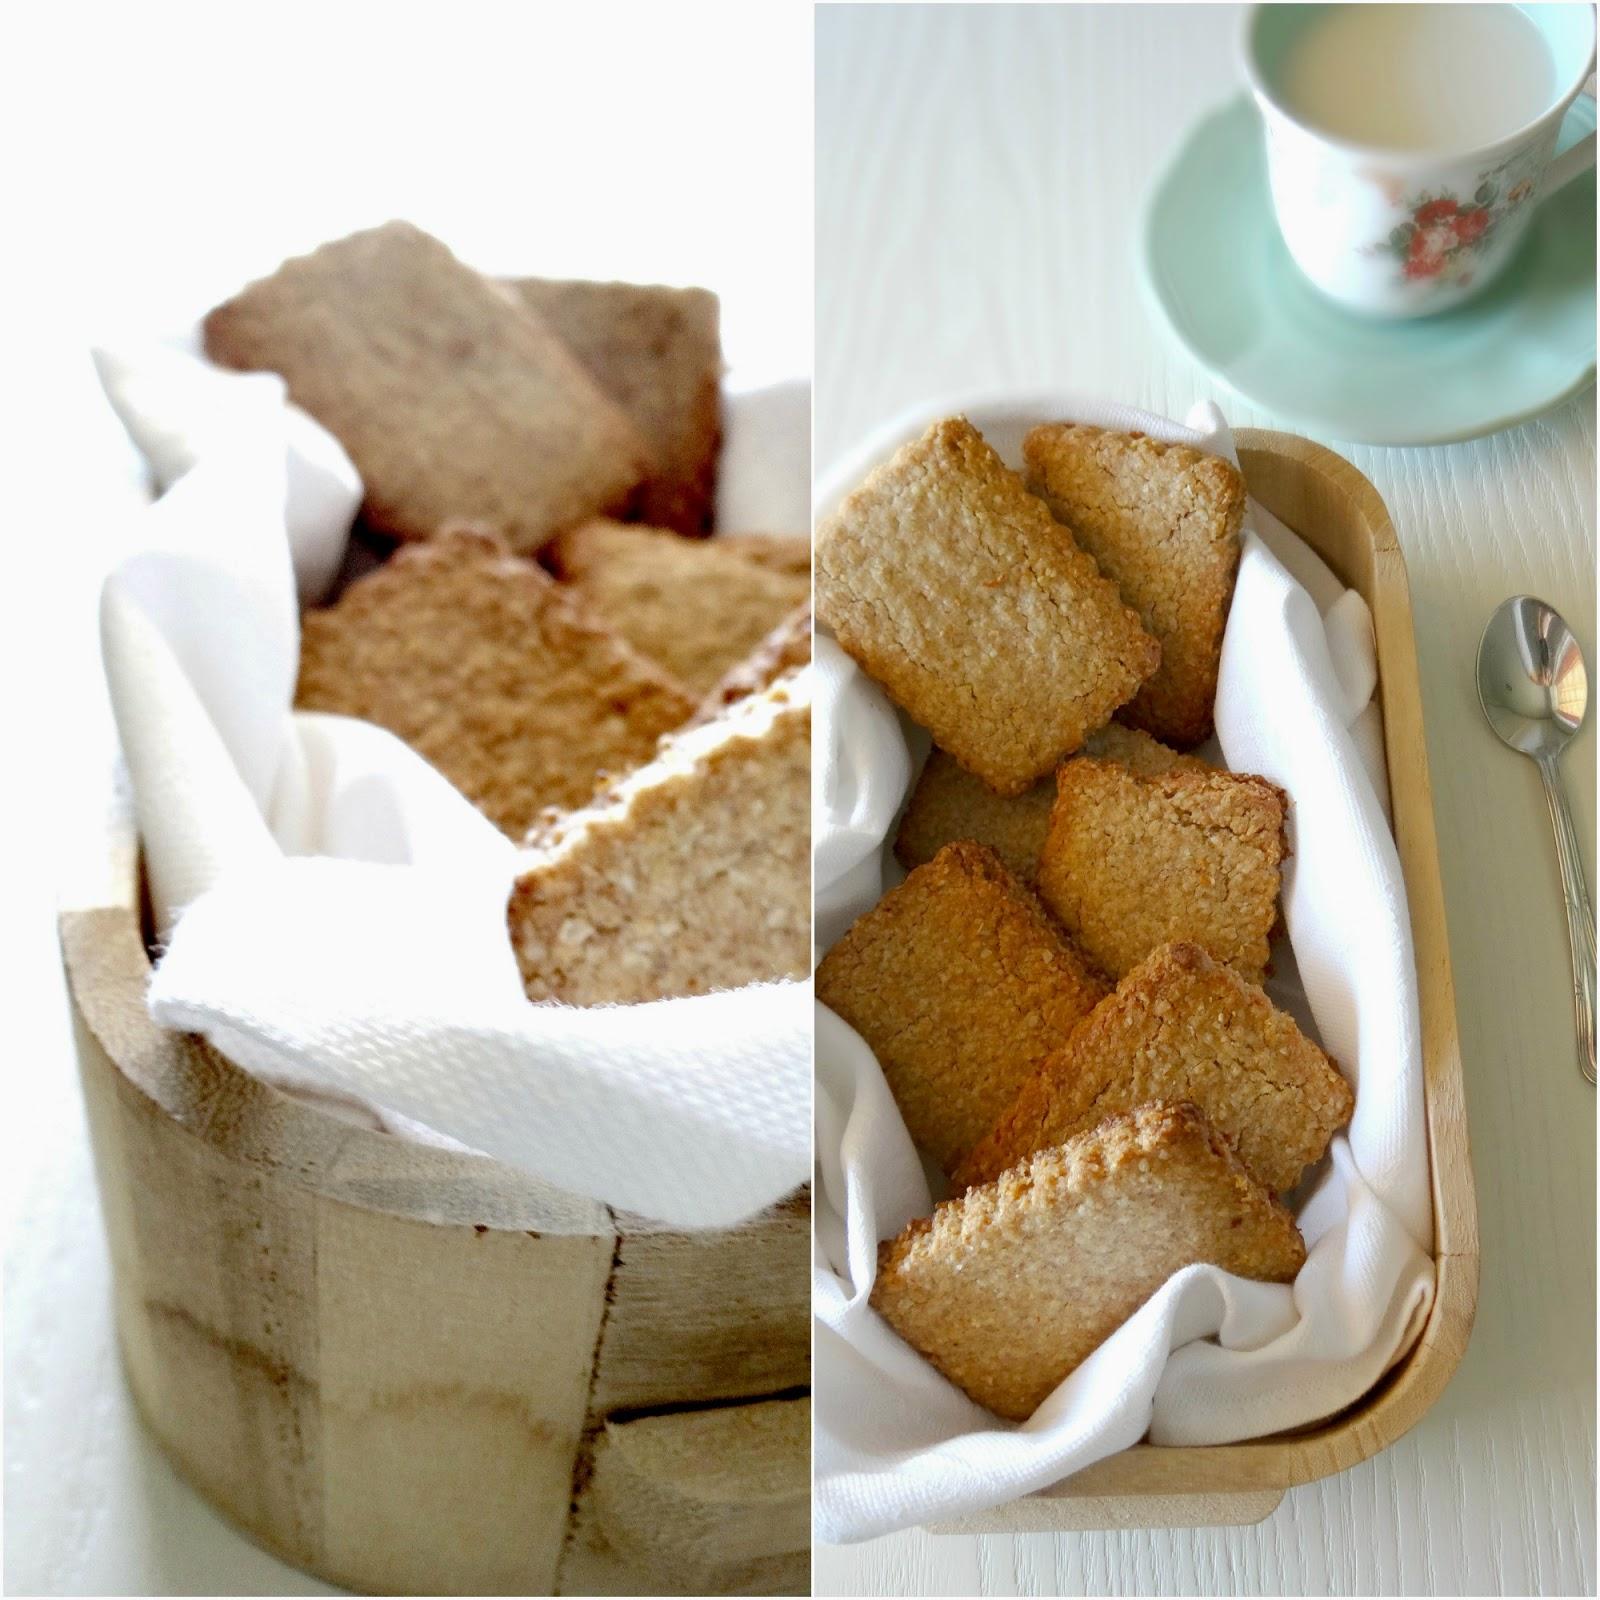 Digestive, biscotti inglesi, biscotti integrali, avena, latte, miele, limone